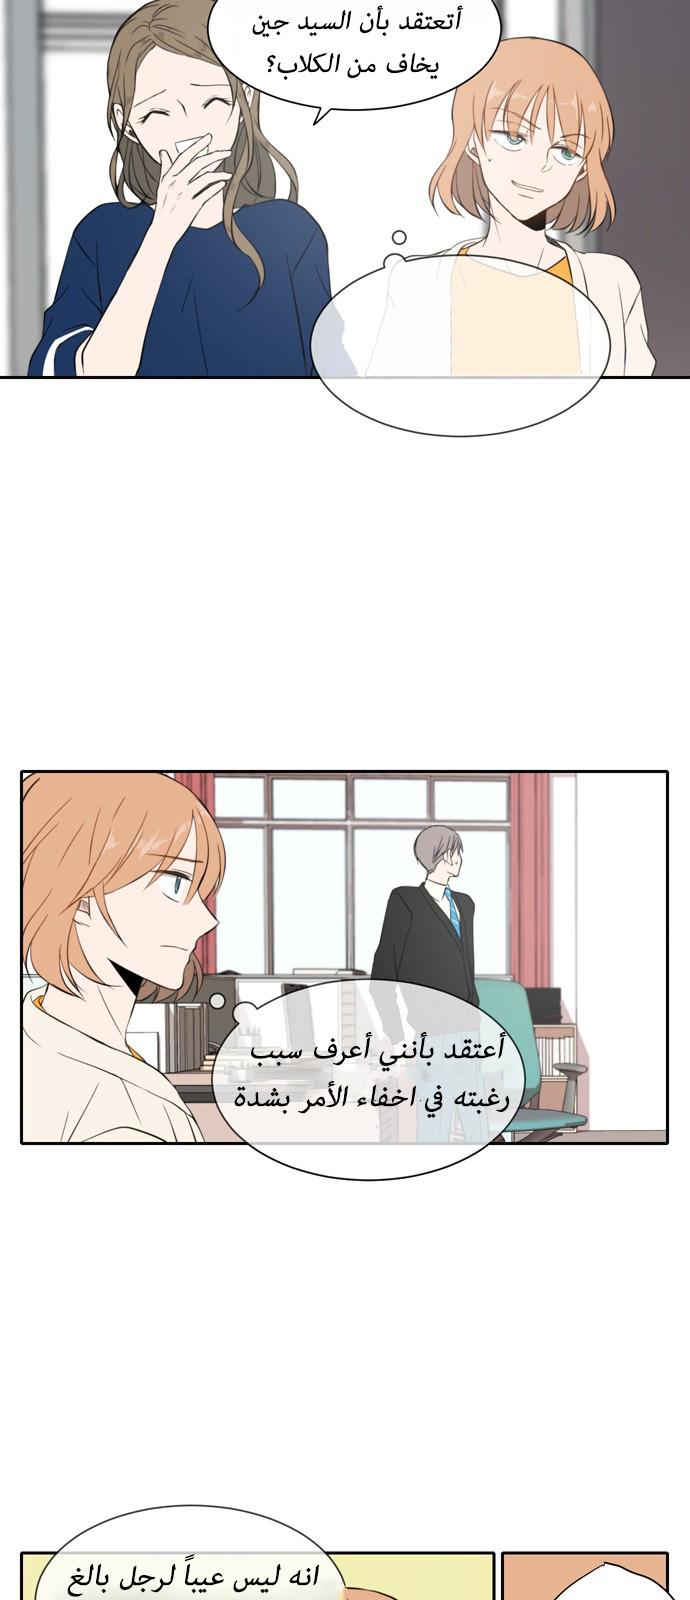 الفصل 13 من مانهوا Lovely Again Today 16_06110